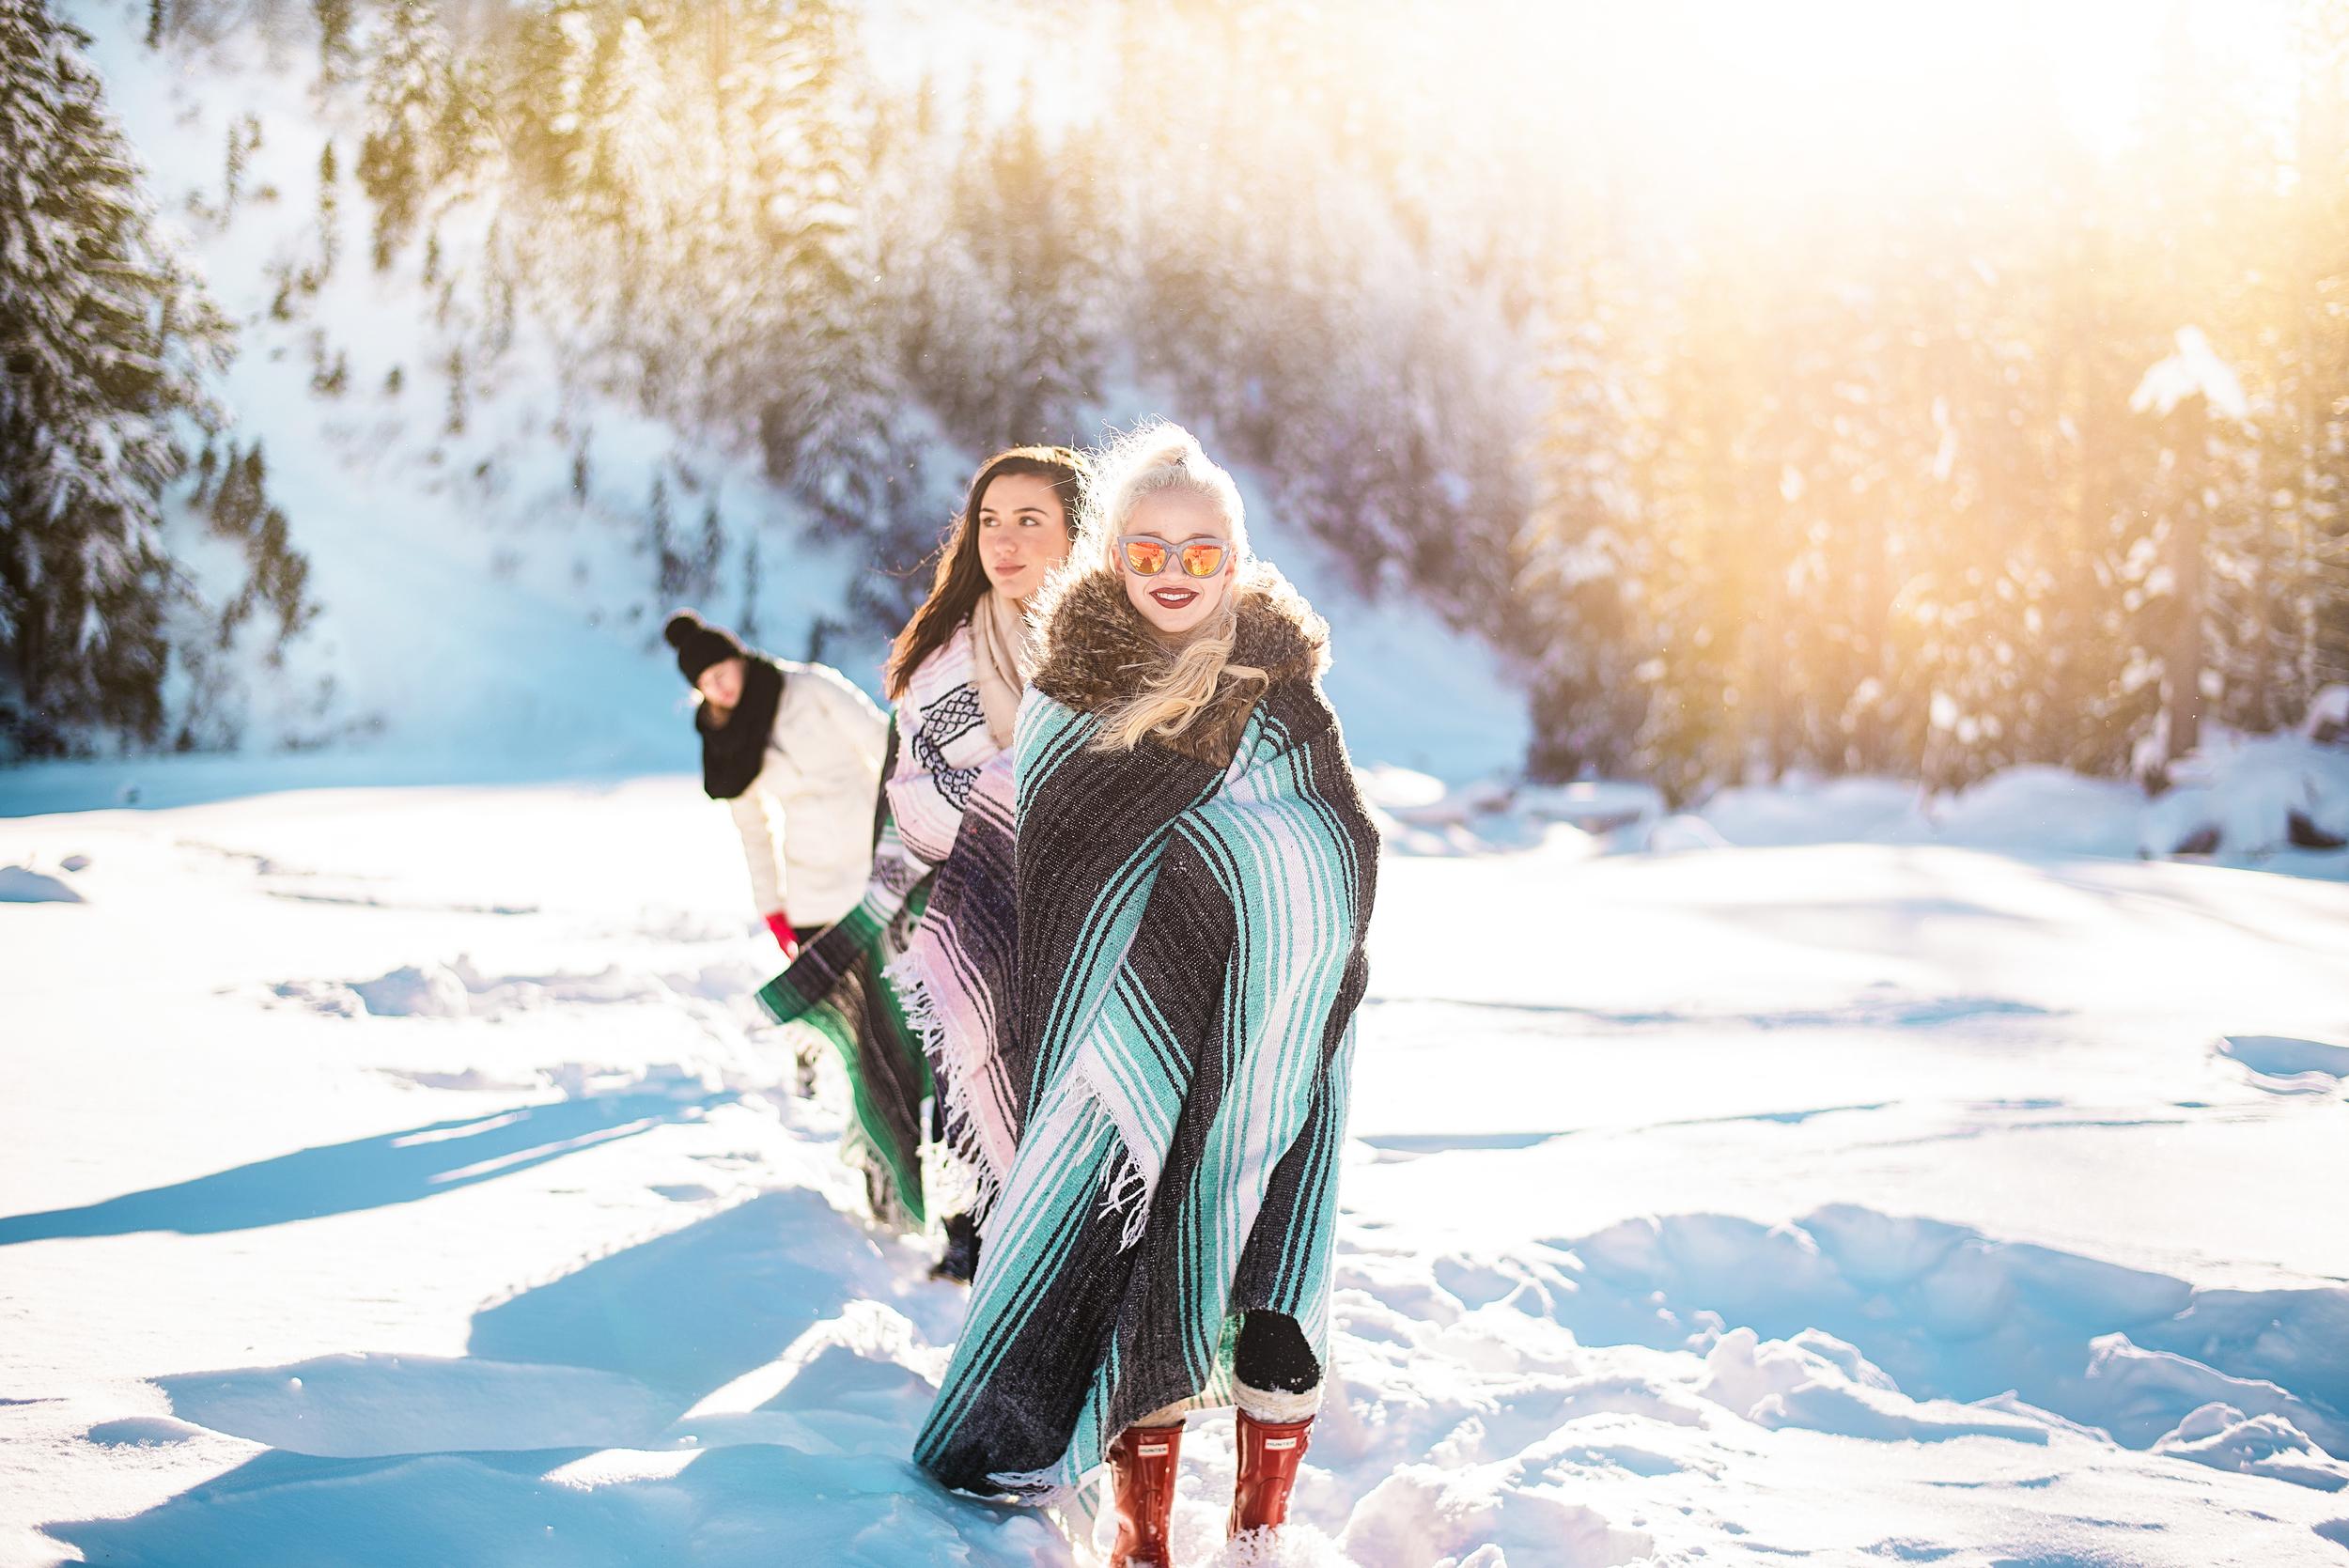 Winter Shoot - Mt Rainier 2015 2015- Proofs-0298R.jpg